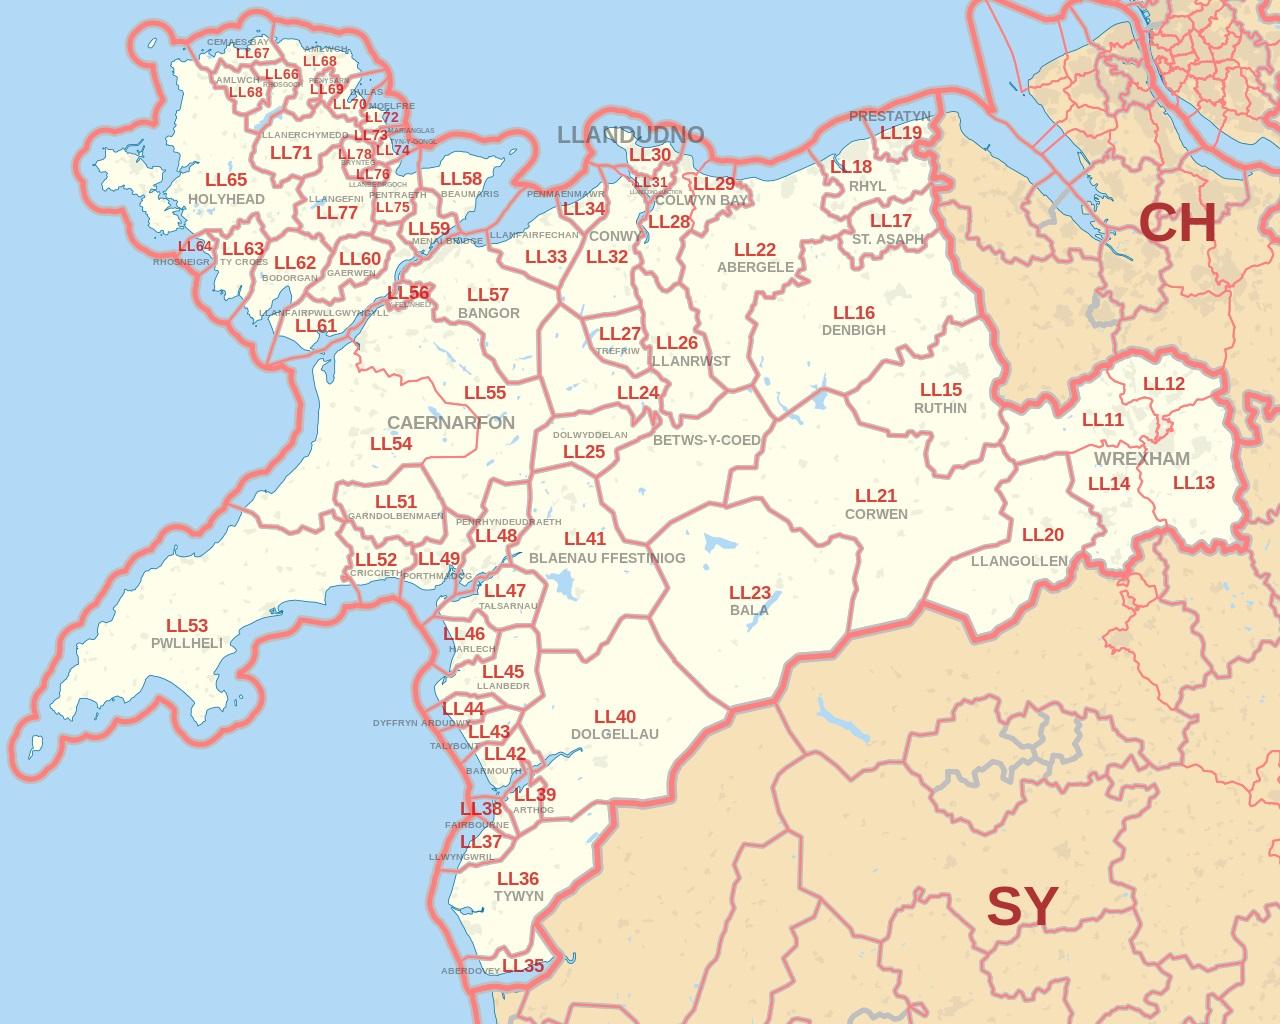 Llandudno map